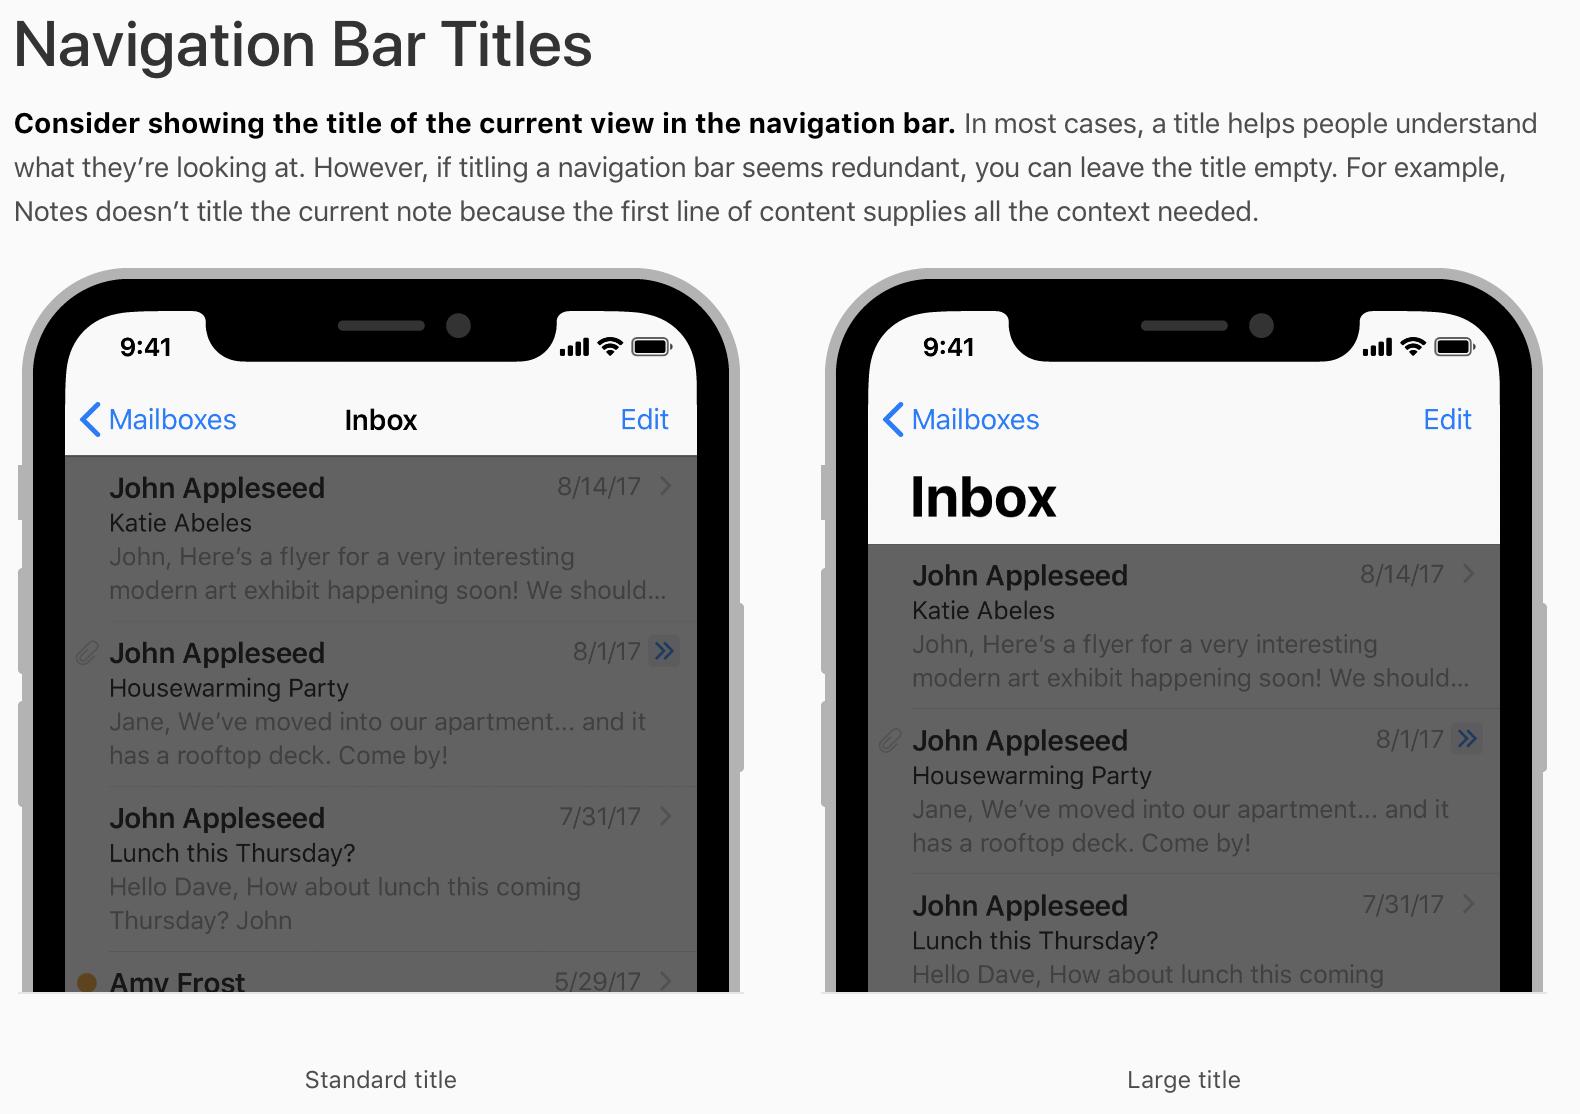 Source:https://developer.apple.com/ios/human-interface-guidelines/bars/navigation-bars/